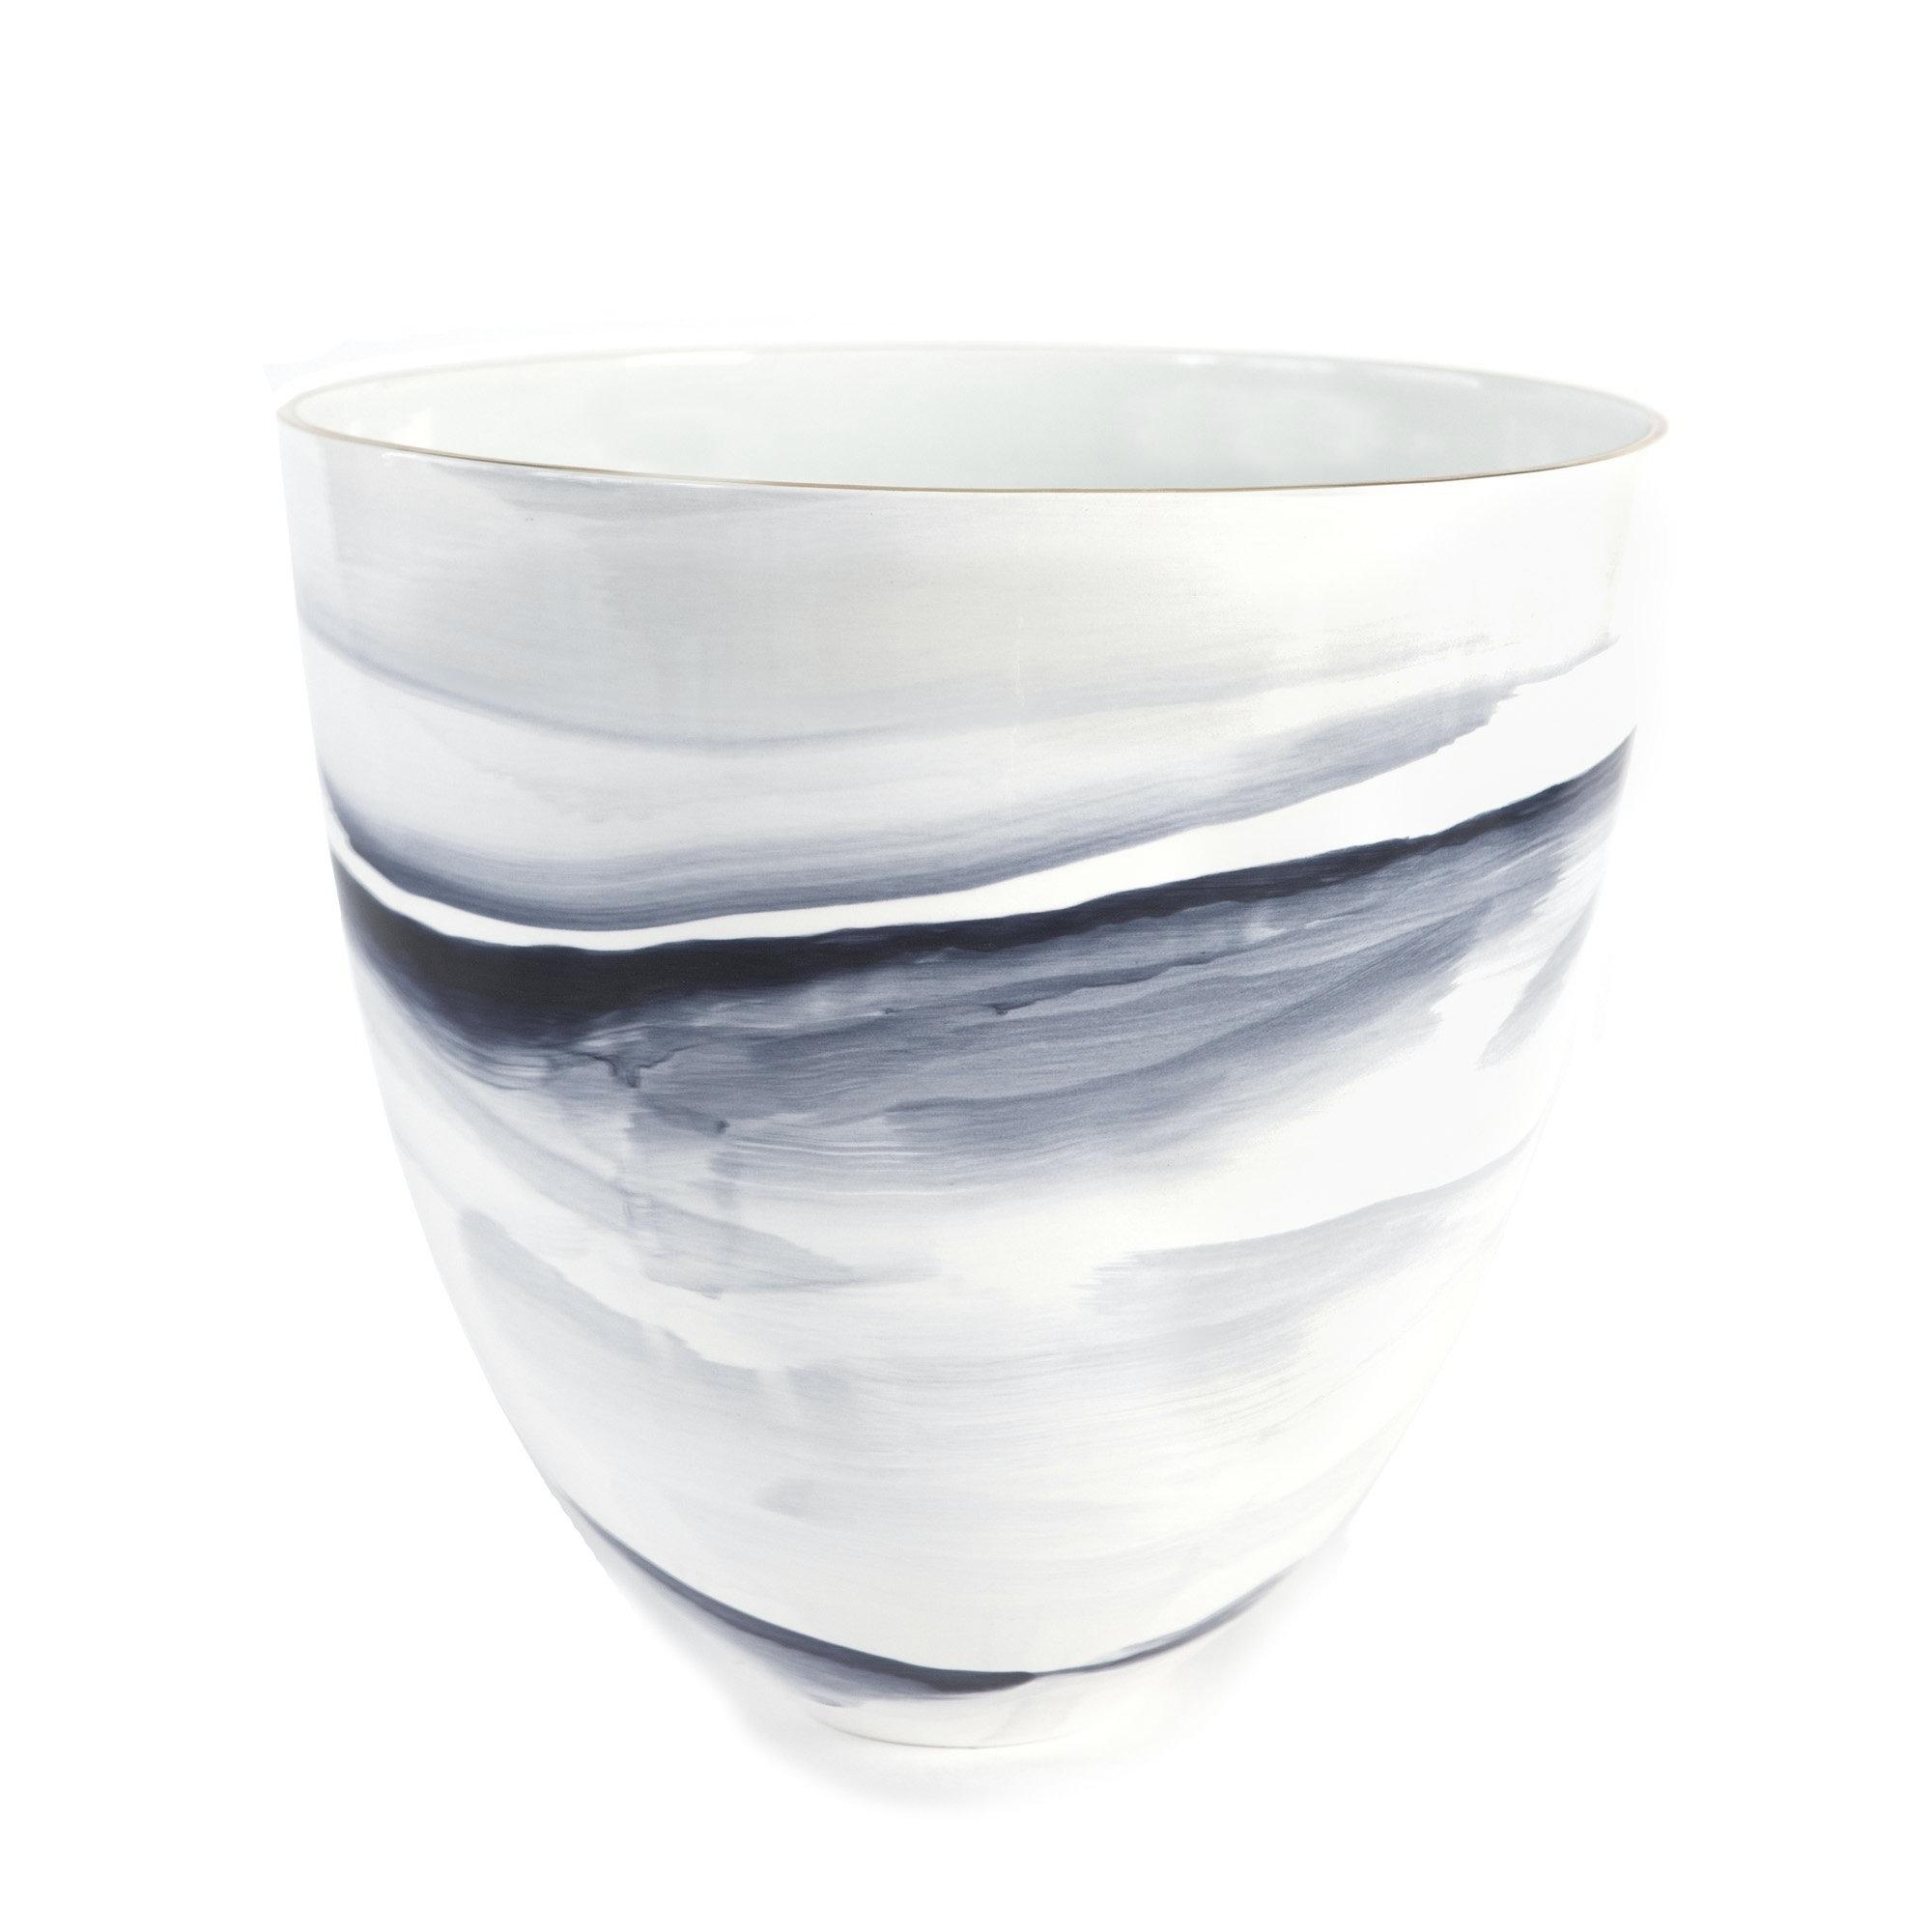 Jill Rosenwald Ceramics